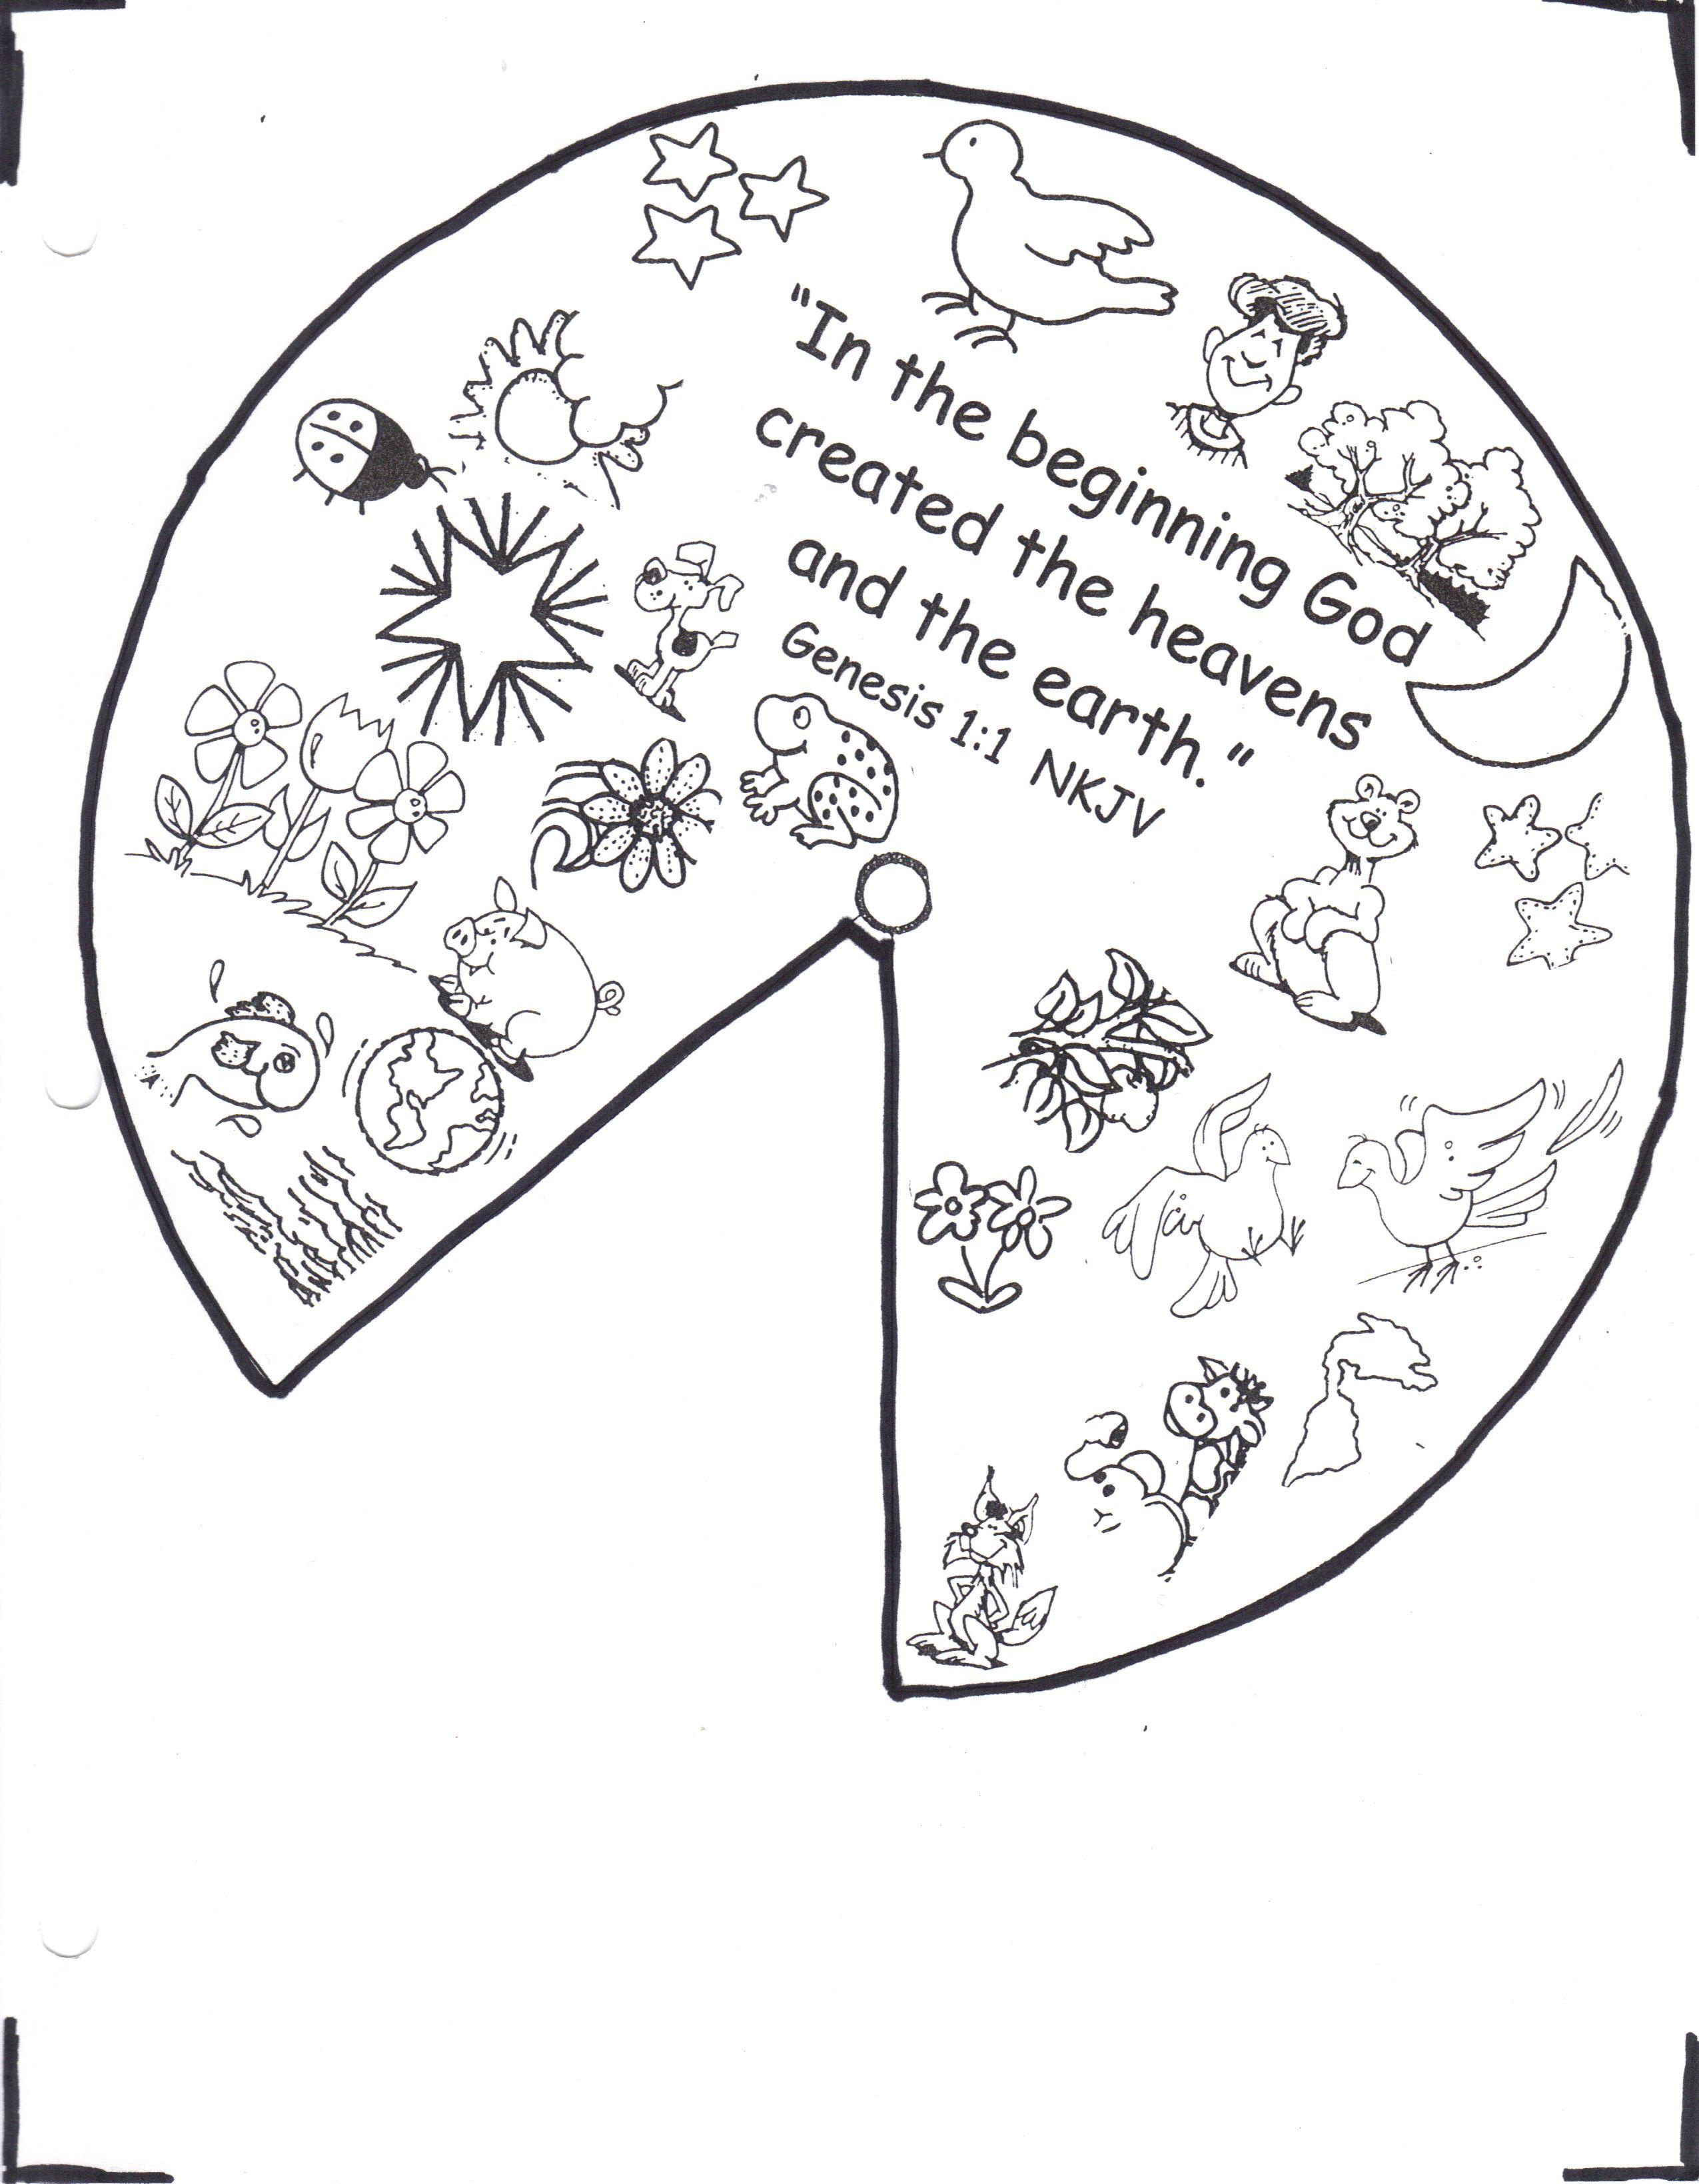 Good samaritan sunday school craft - Sunday School Crafts Creation Wheel Craft Creation Wheel Part 1 More